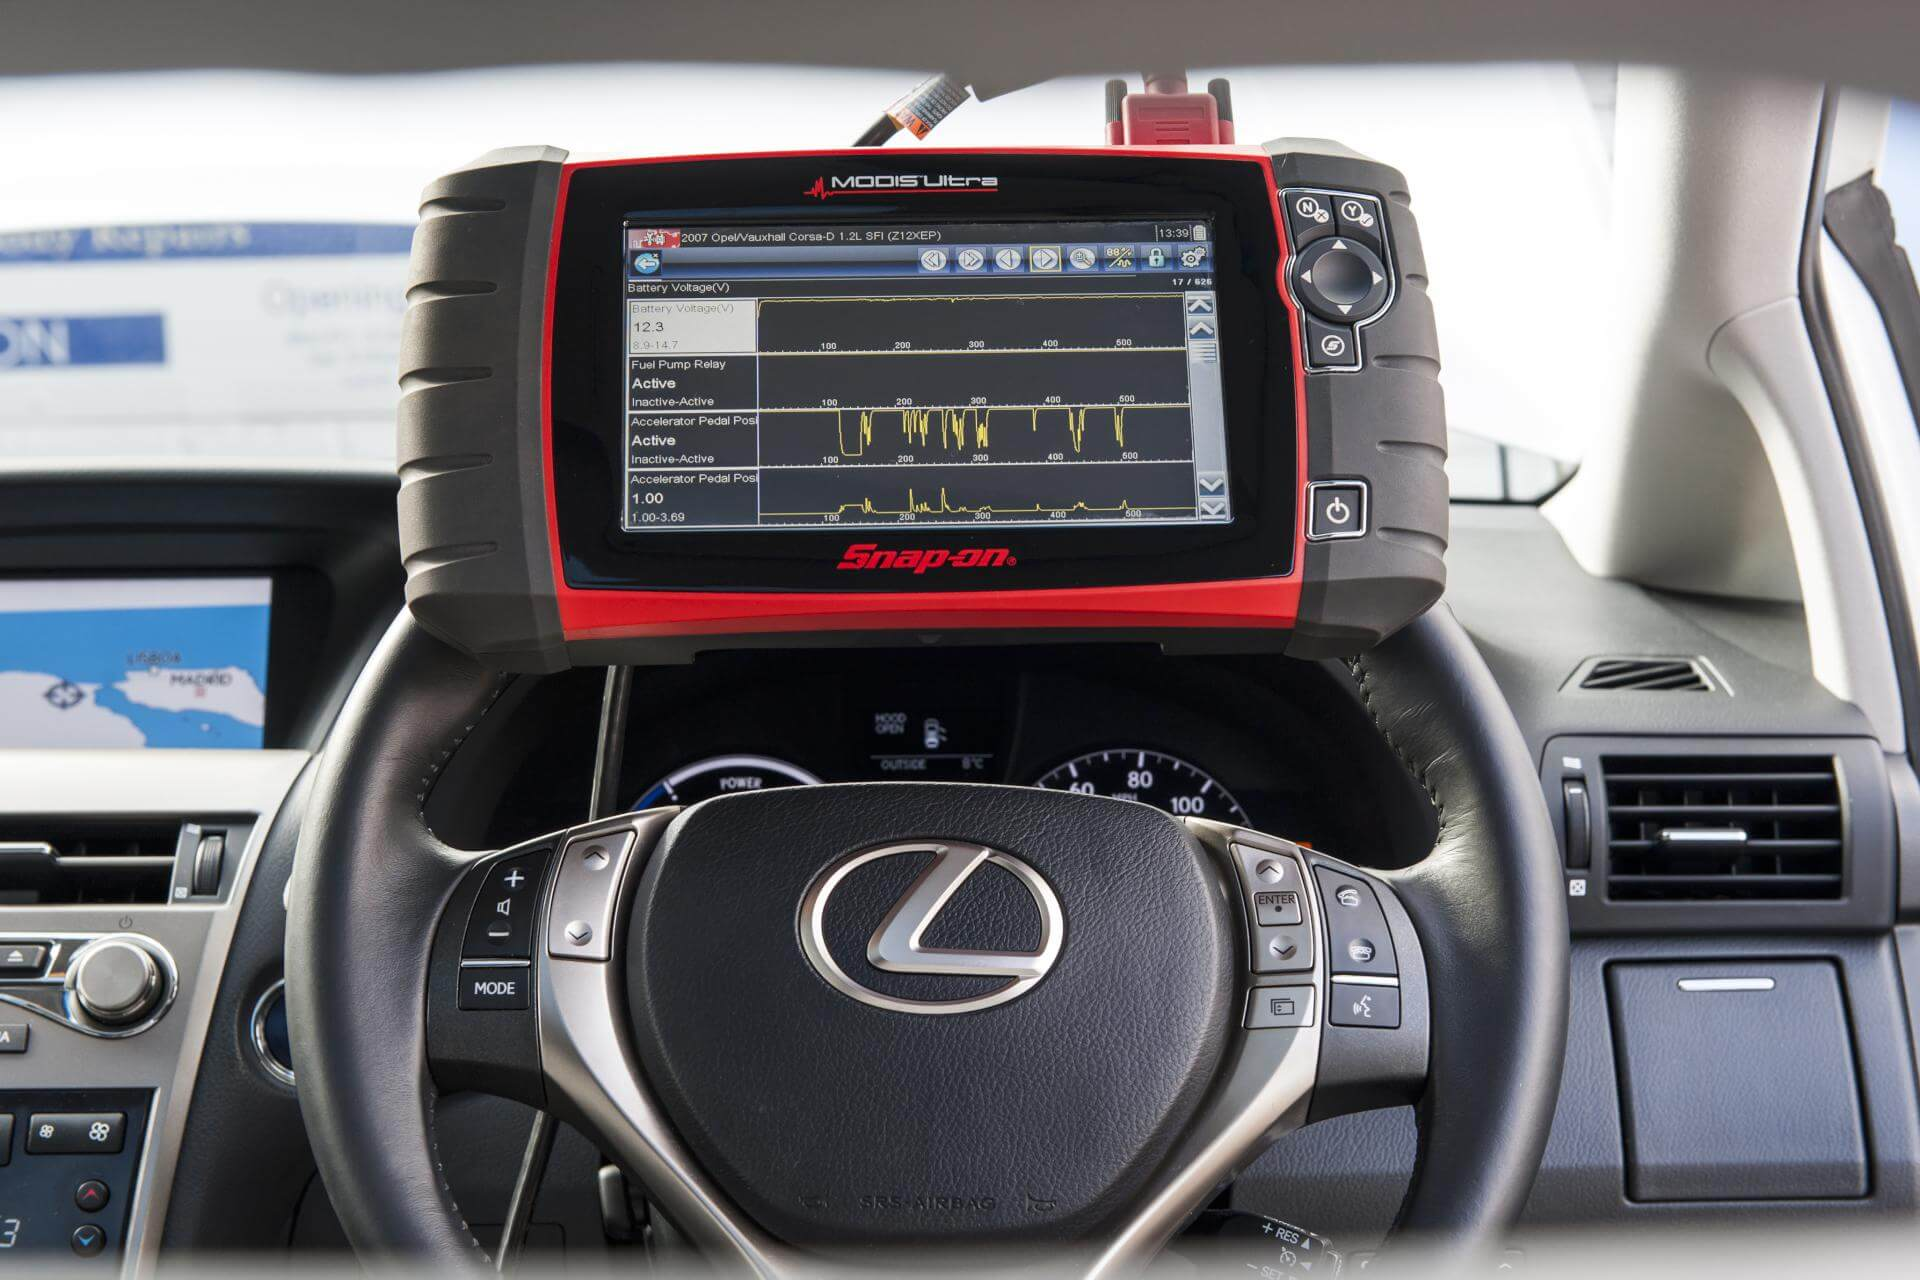 car-diagnostics-service-Bromley